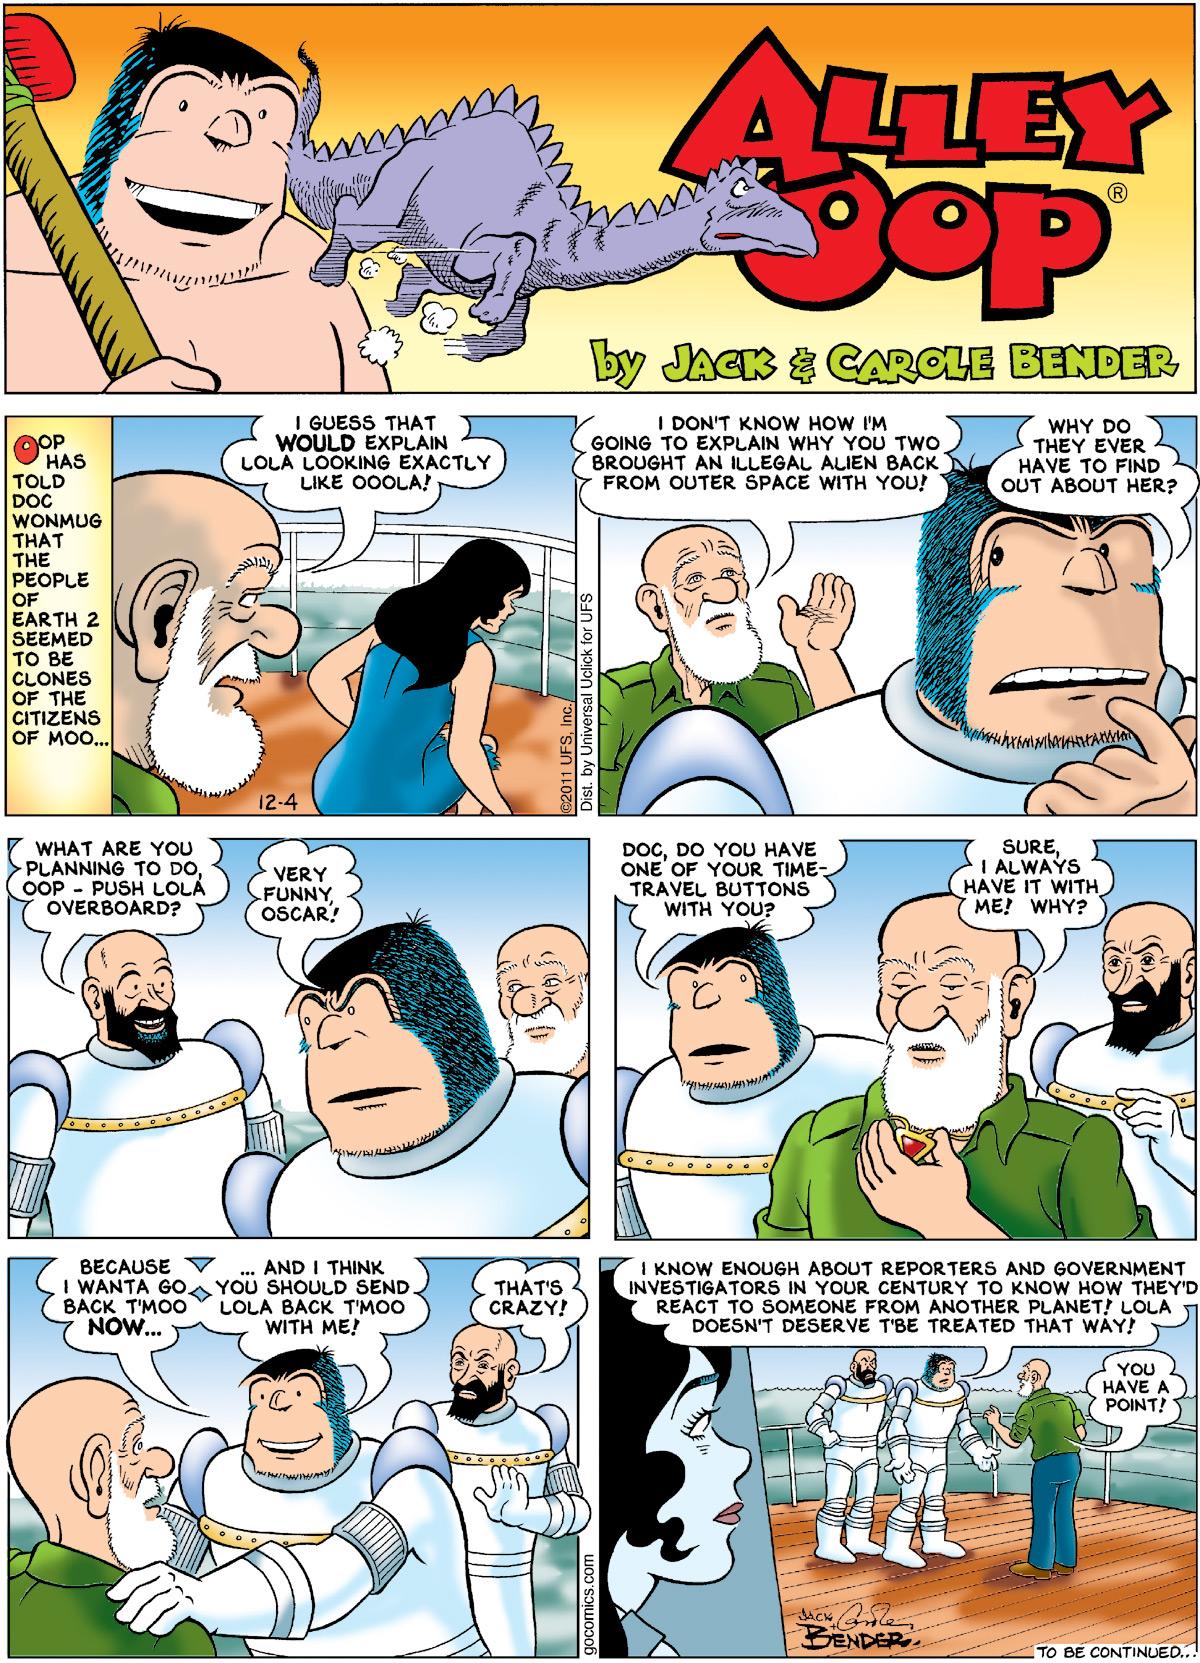 Alley Oop for Dec 4, 2011 Comic Strip